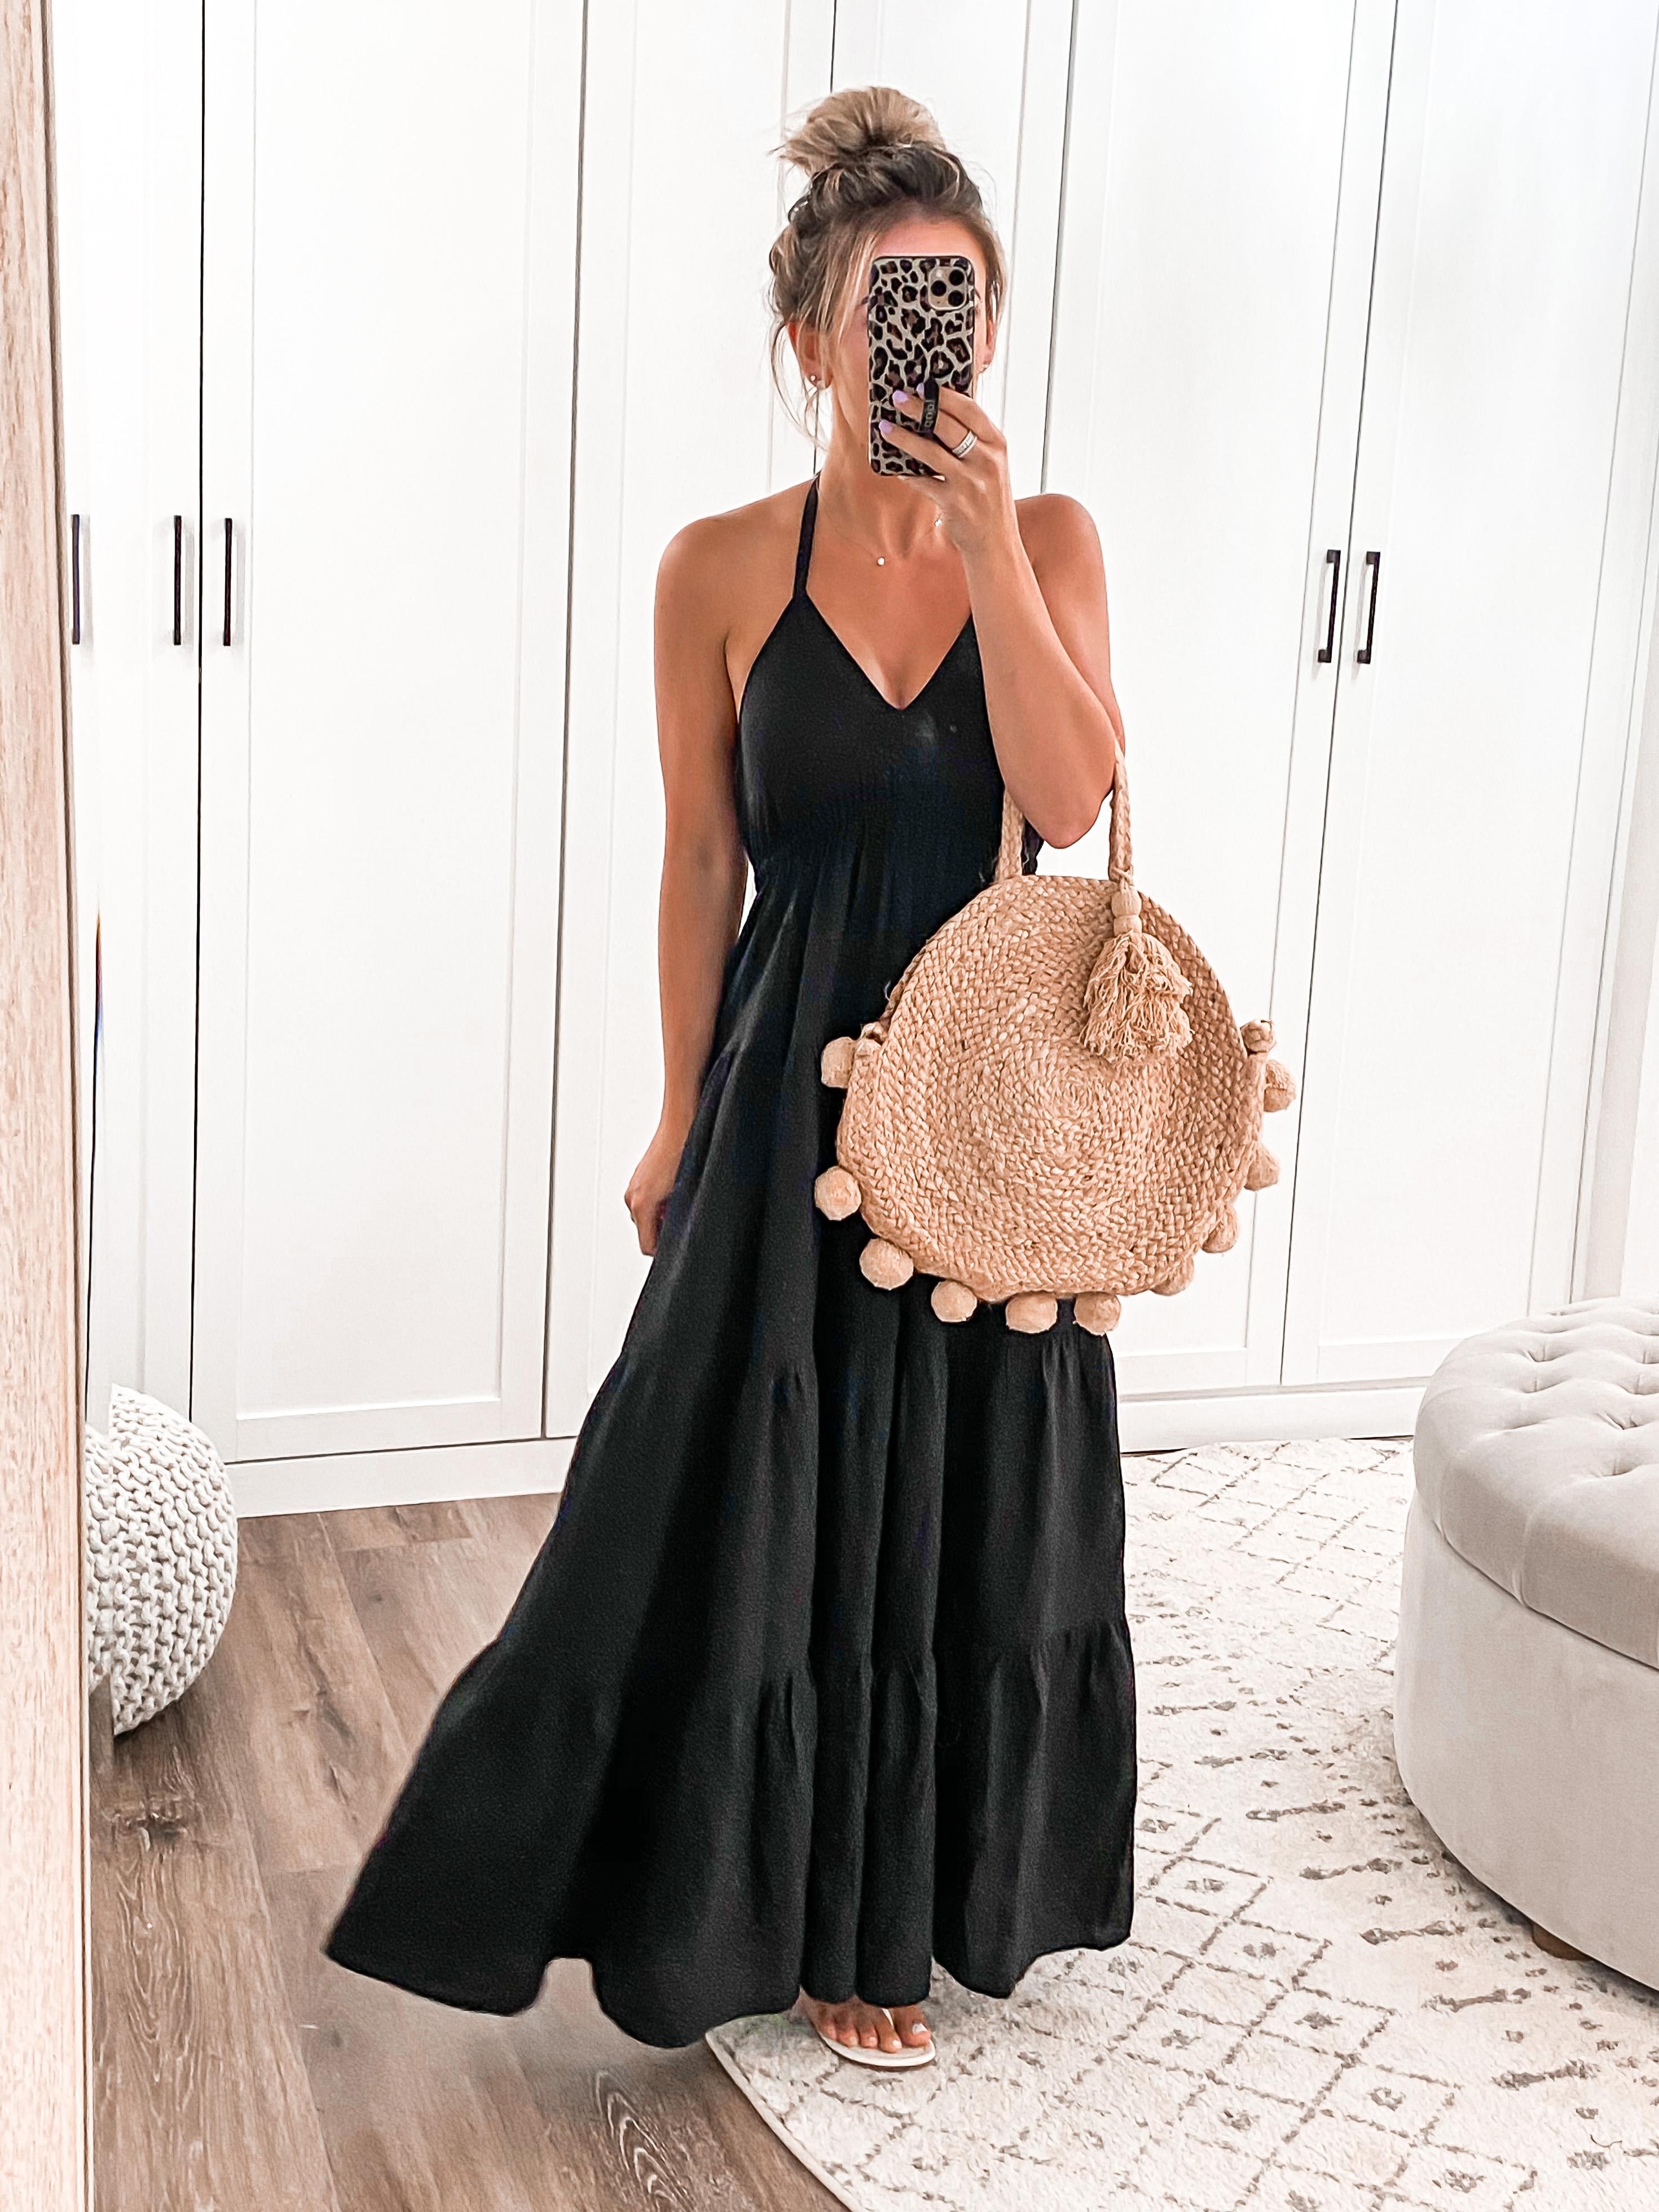 LAURA BEVERLIN BLACK SUMMER MAXI DRESS PETITE OUTFIT EXPRESS